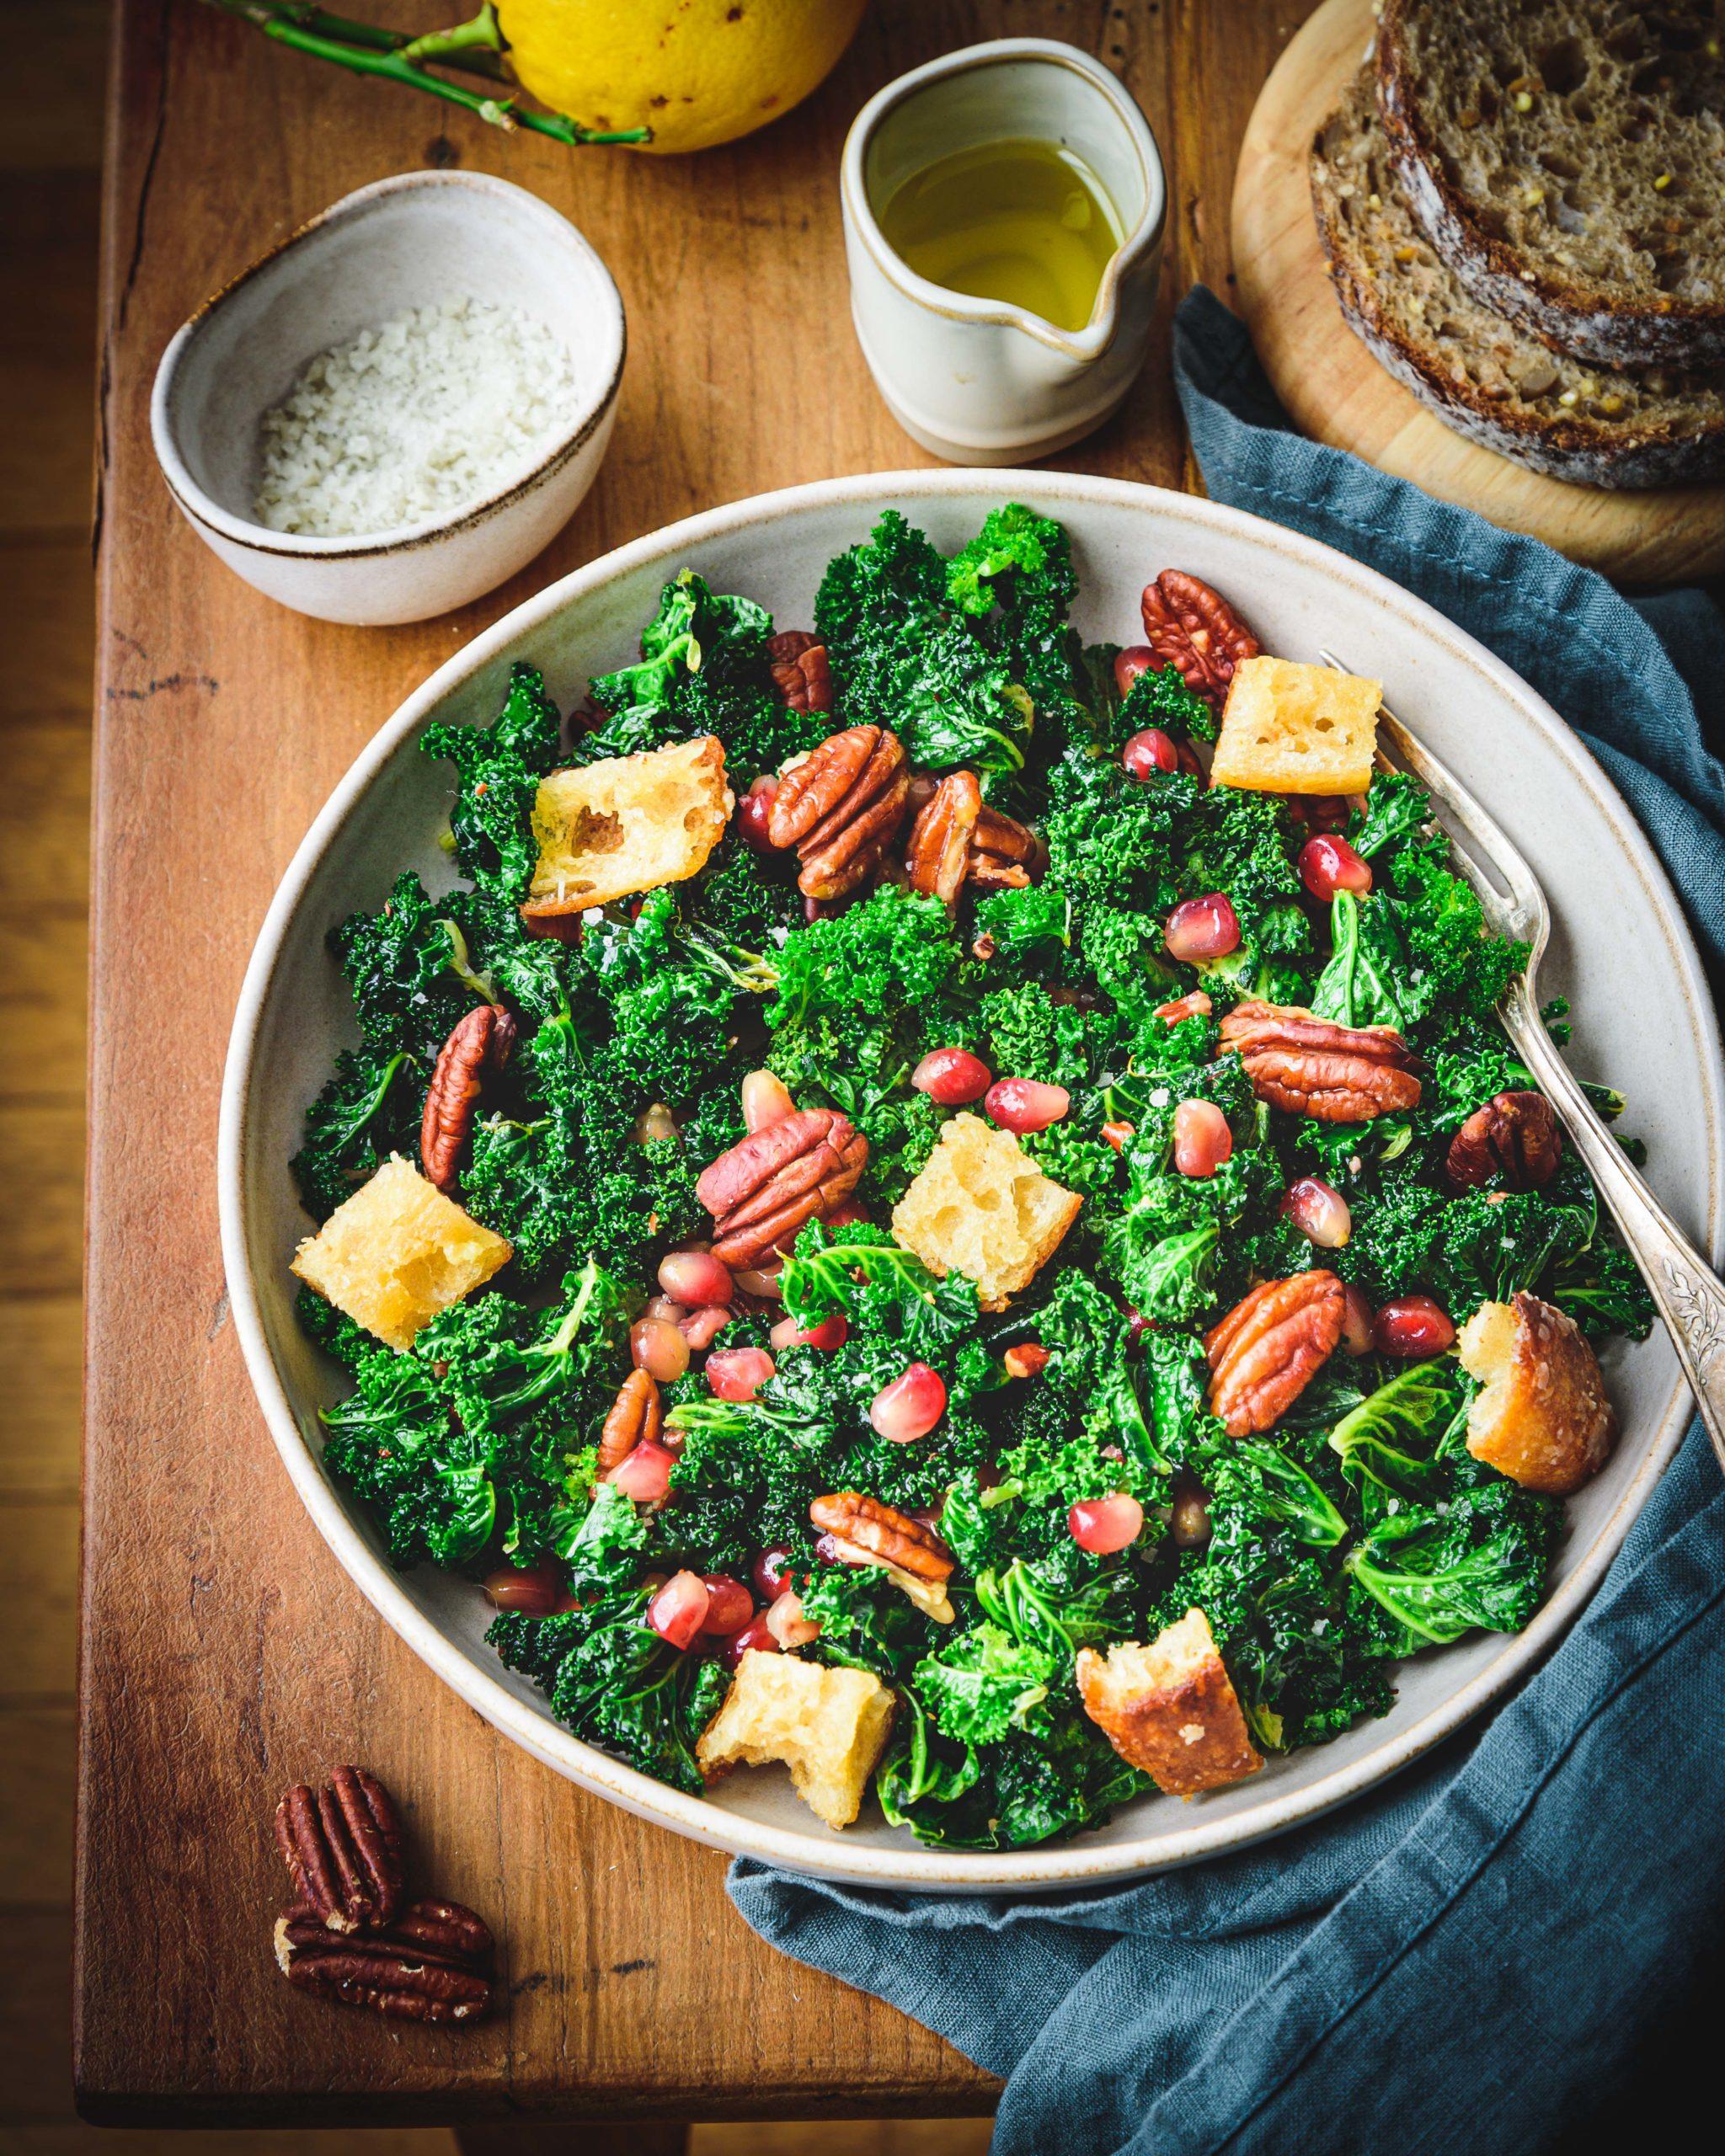 Salade de chou kale, grenade et pécan